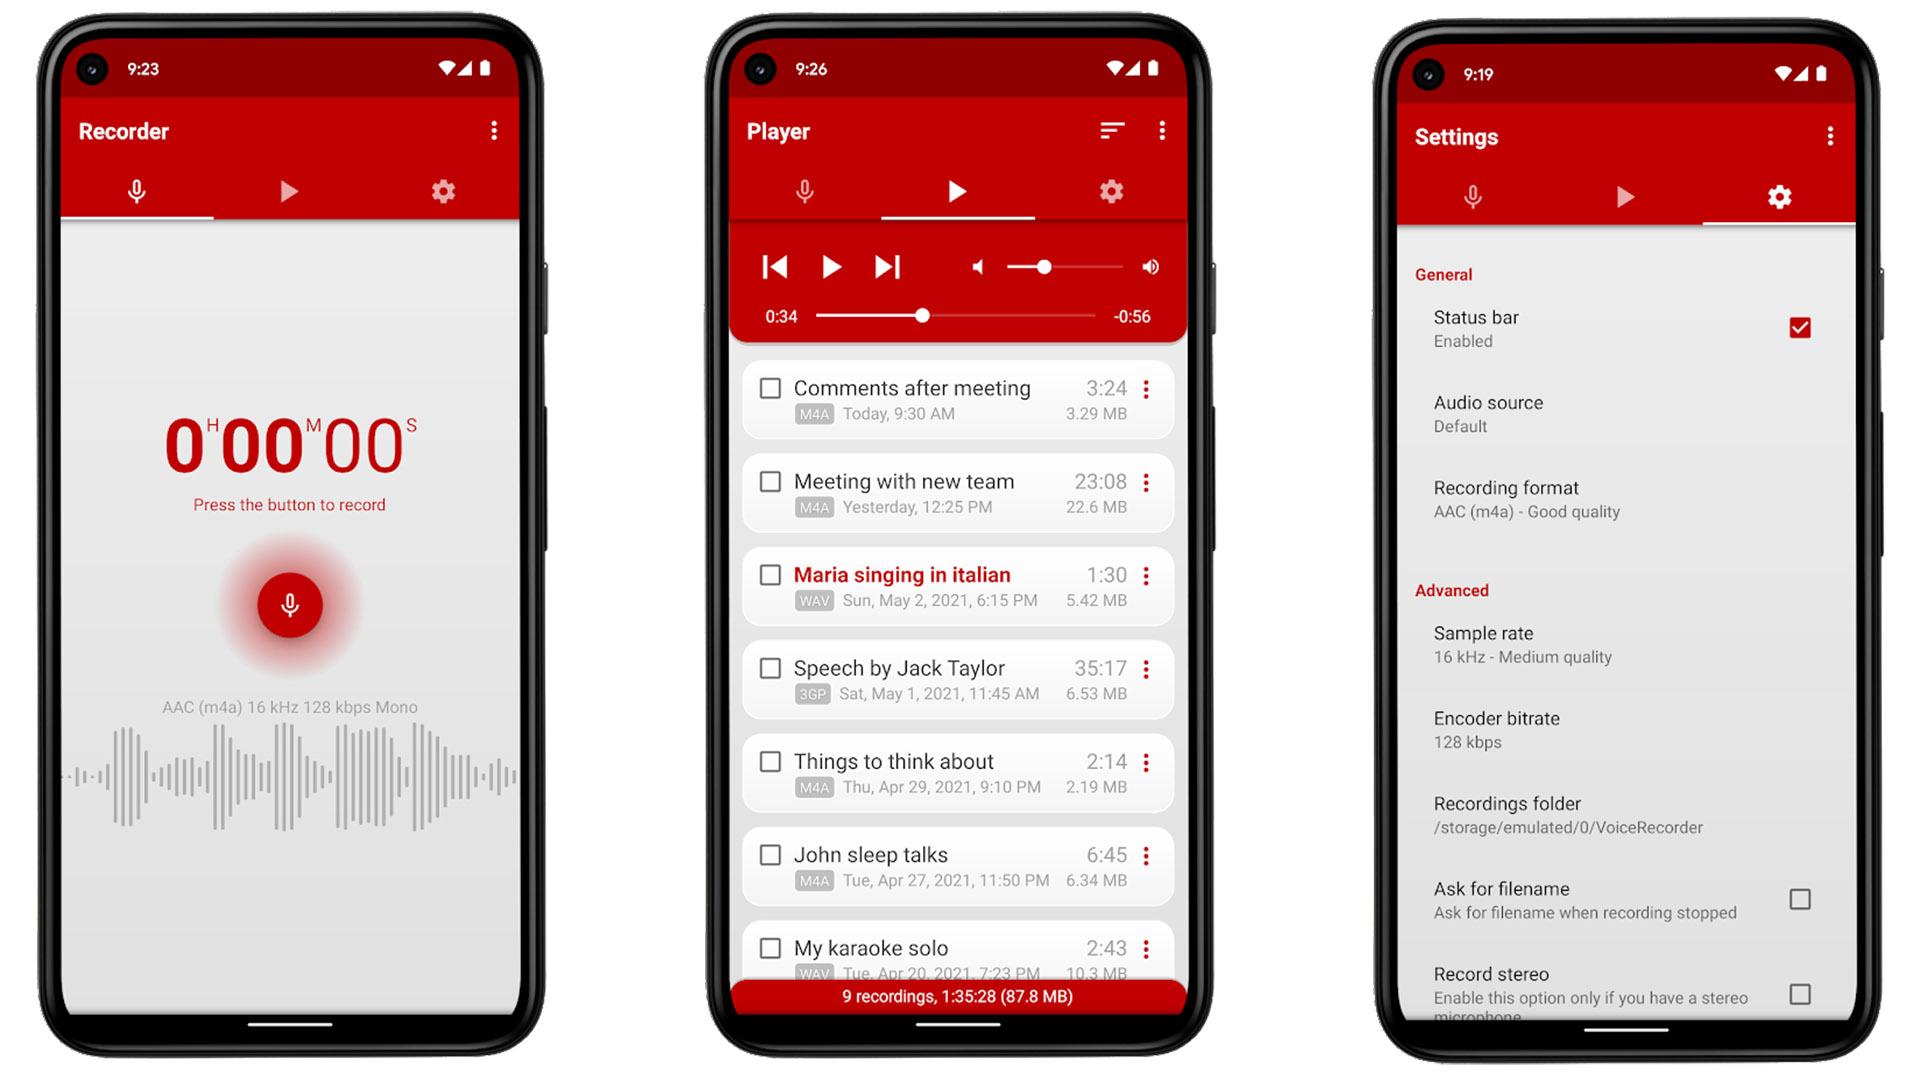 Voice Recorder Pro screenshot 2021